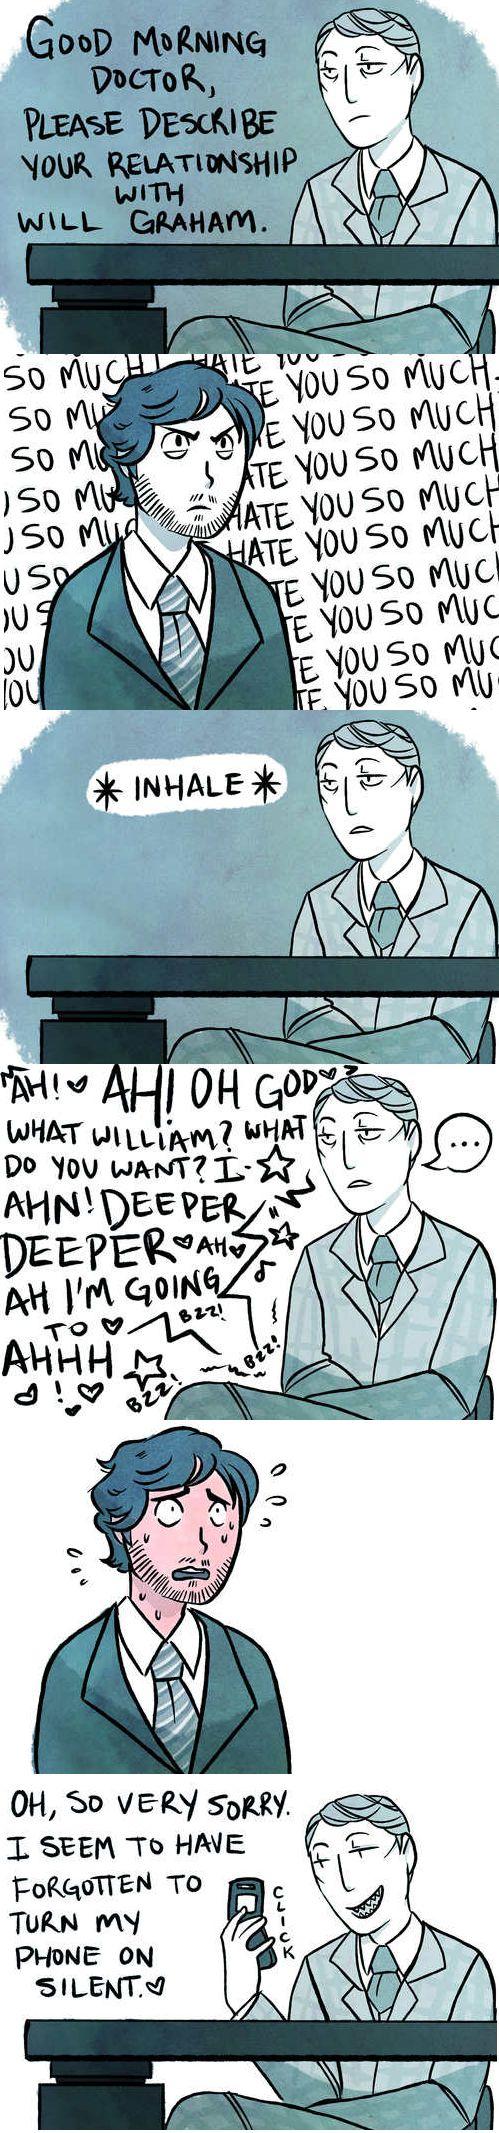 http://stupidcrown.tumblr.com/